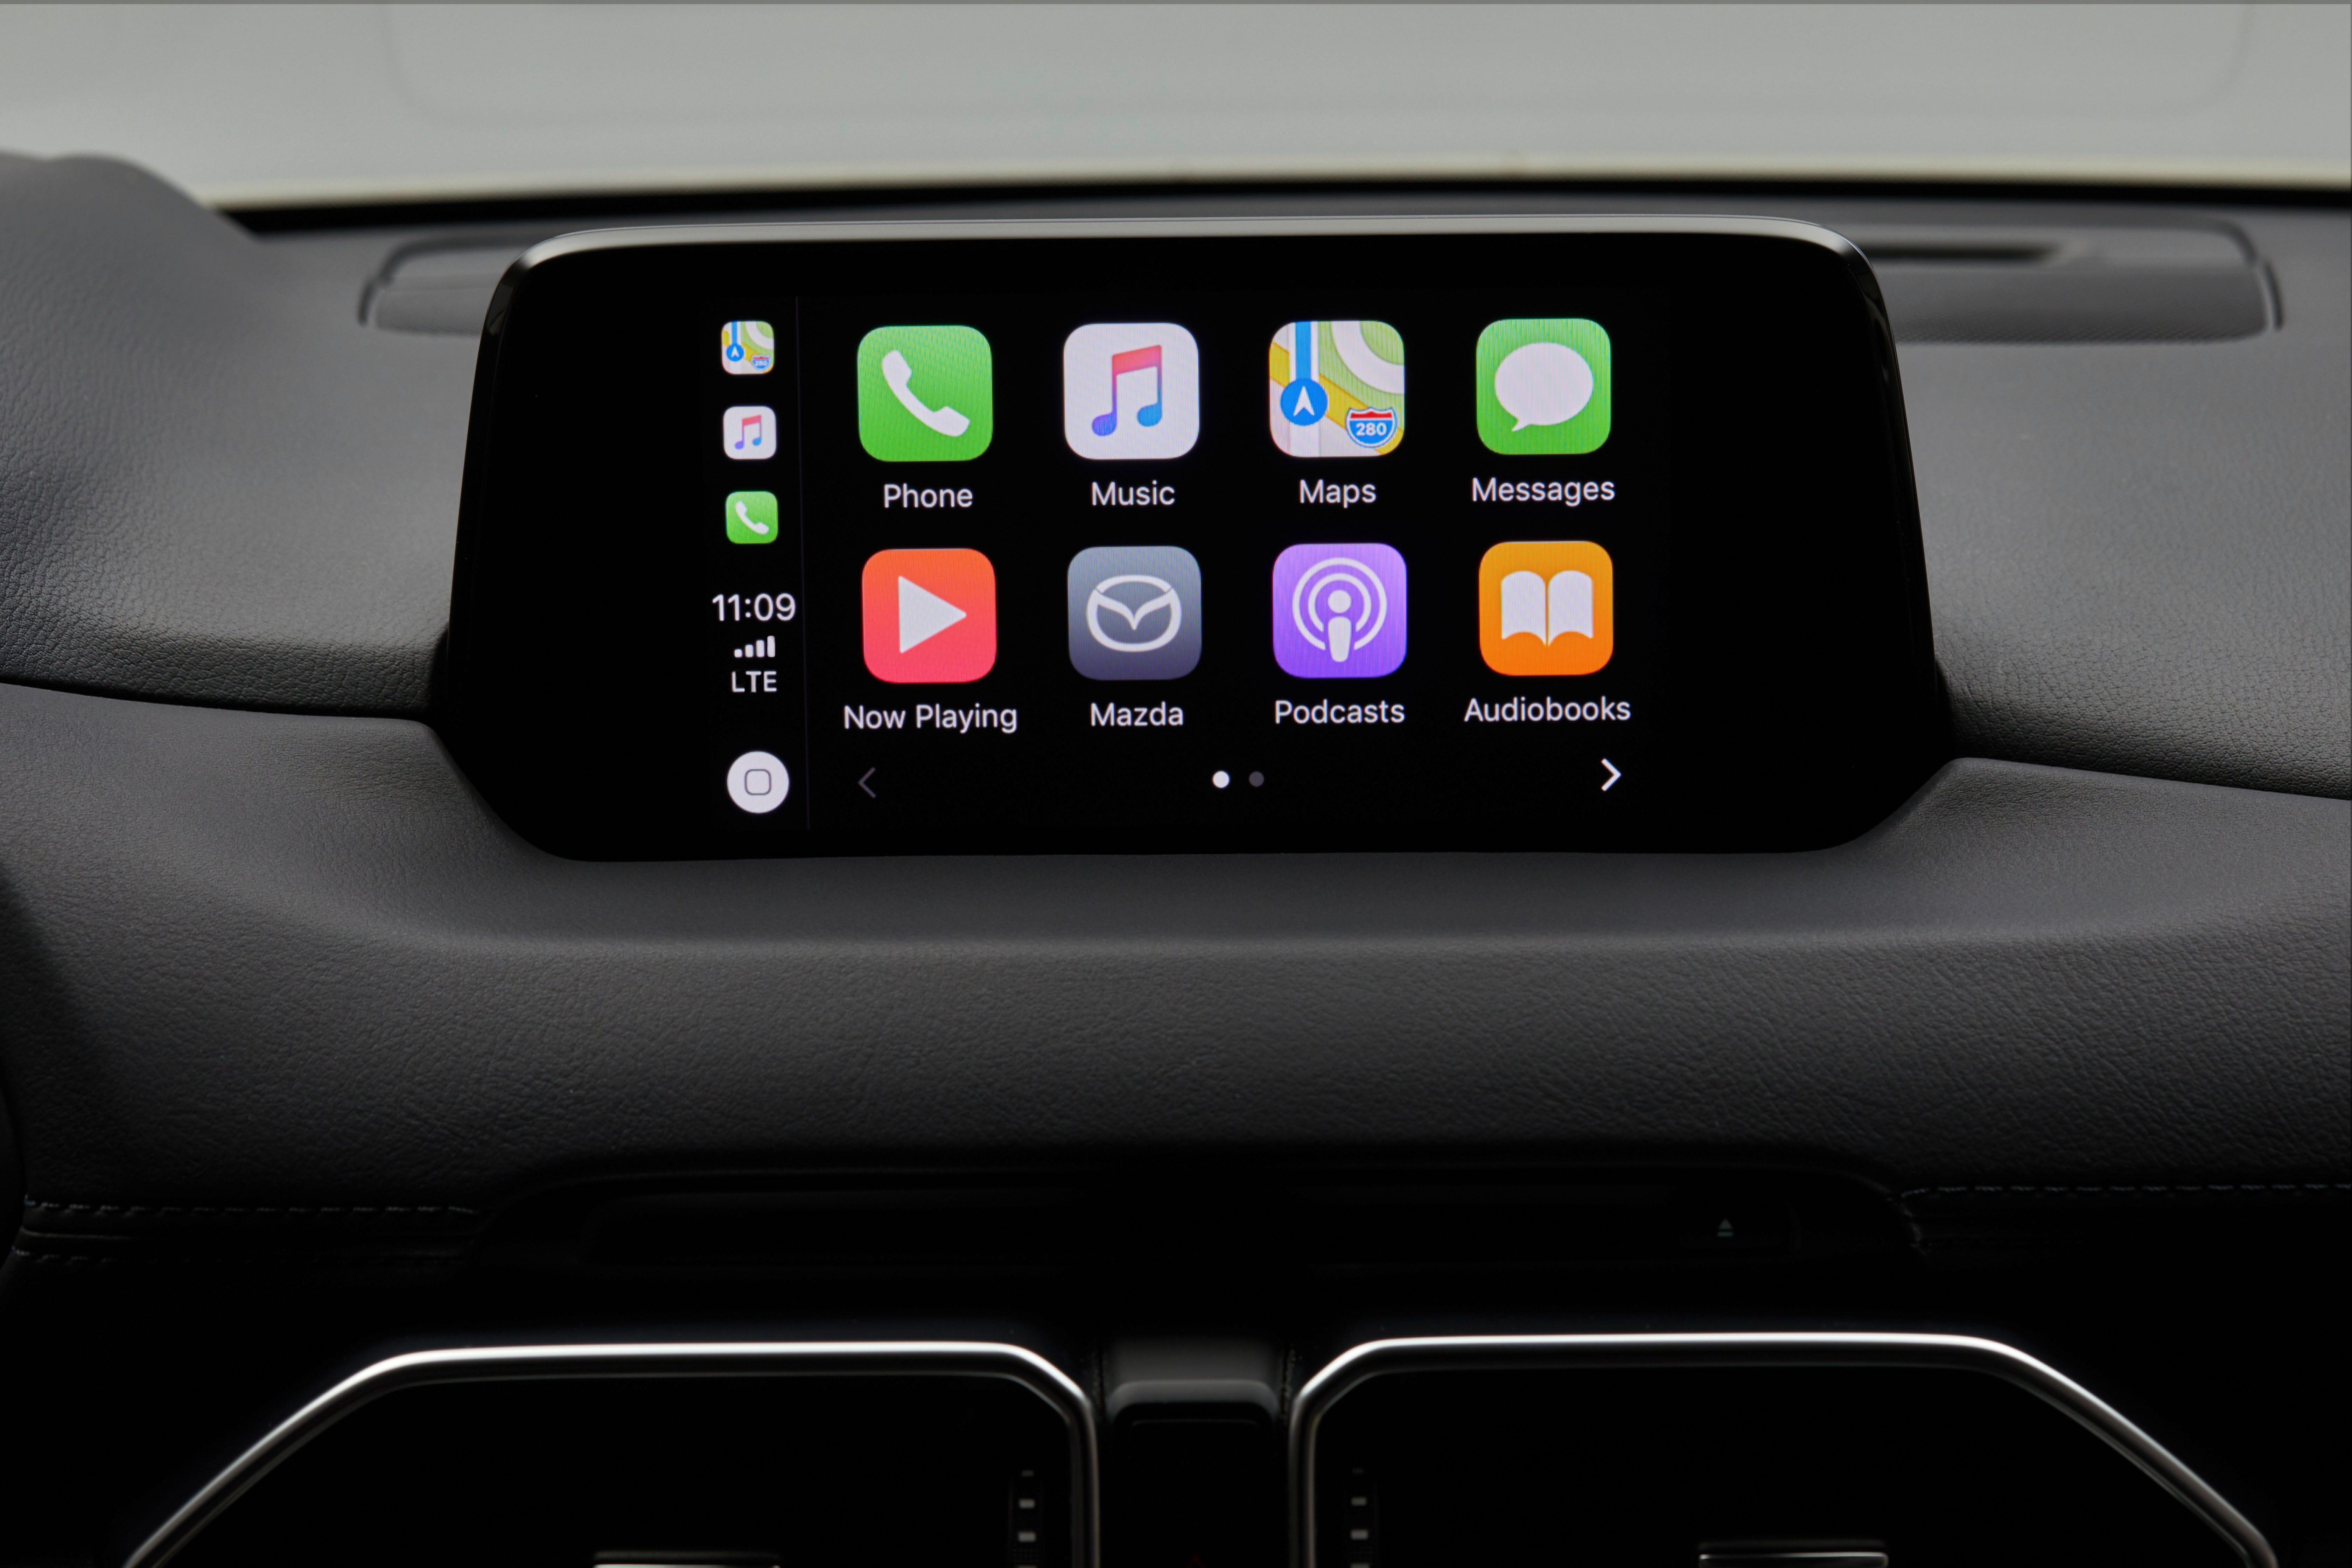 https://maweko.mazda.at/wp-content/uploads/sites/78/2021/06/Apple_CarPlay_Android_Auto.jpg